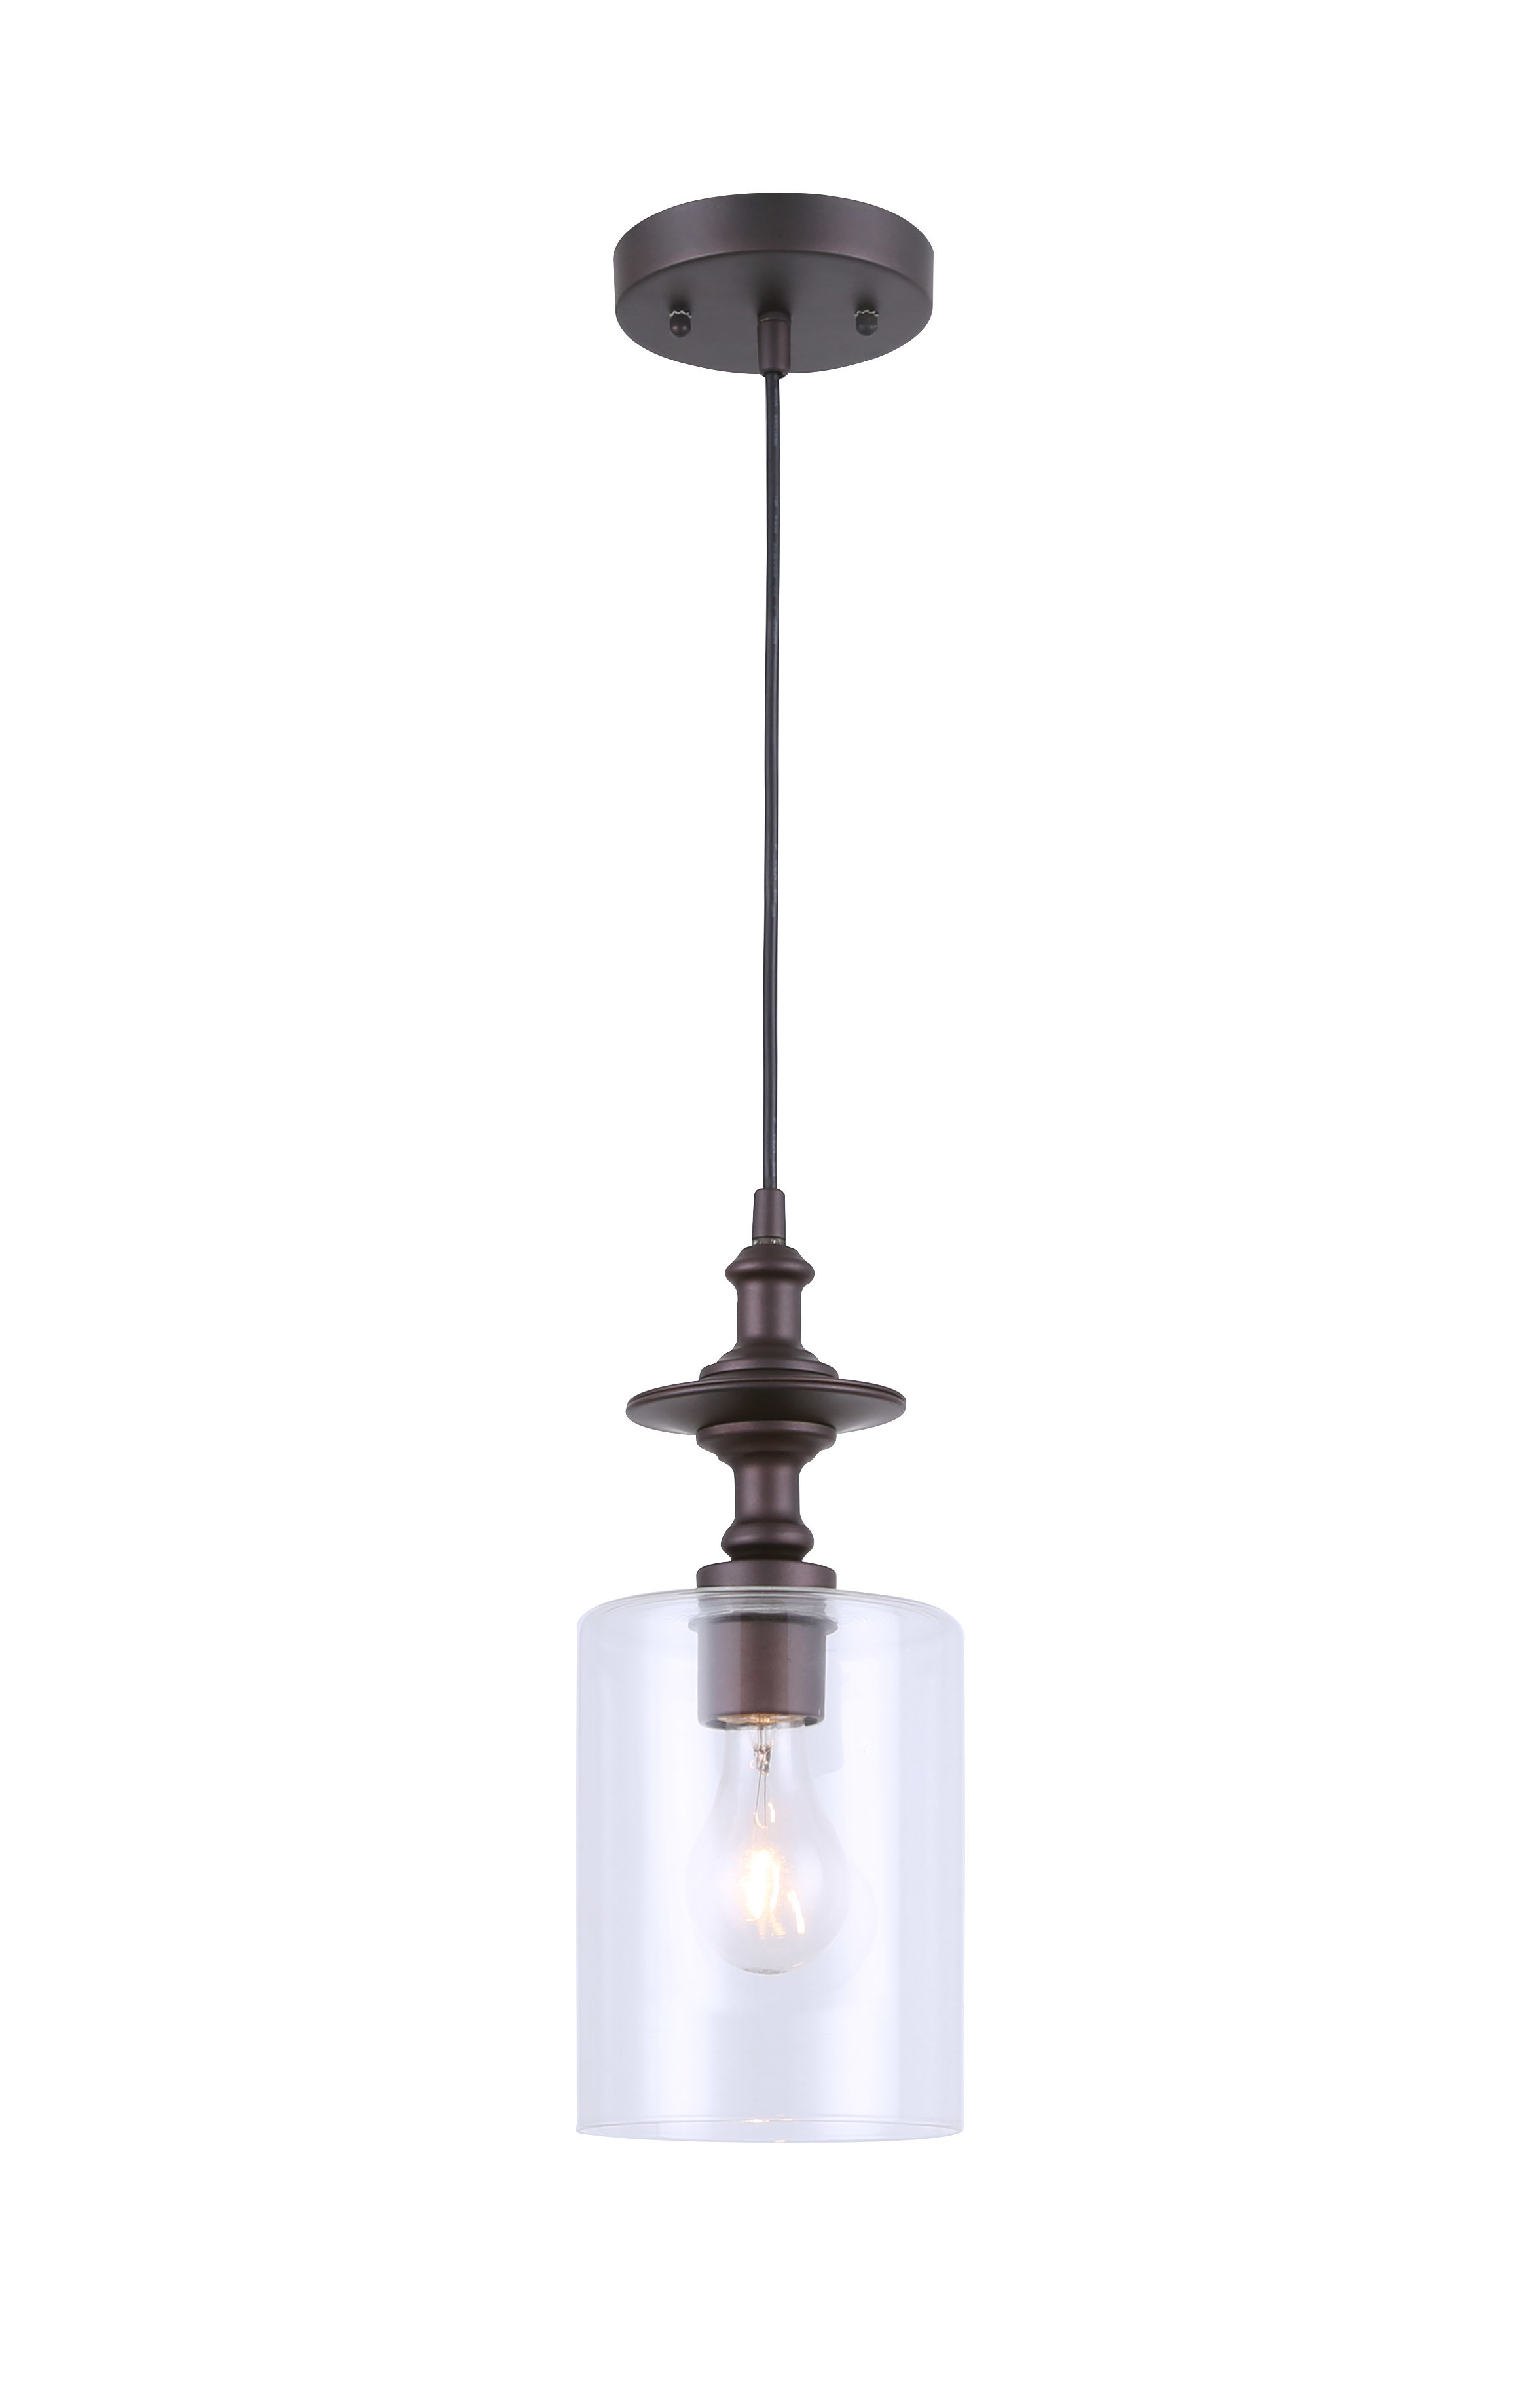 Erico 1 Light Single Bell Pendants In Famous Moyer 1 Light Single Cylinder Pendant (Gallery 9 of 25)